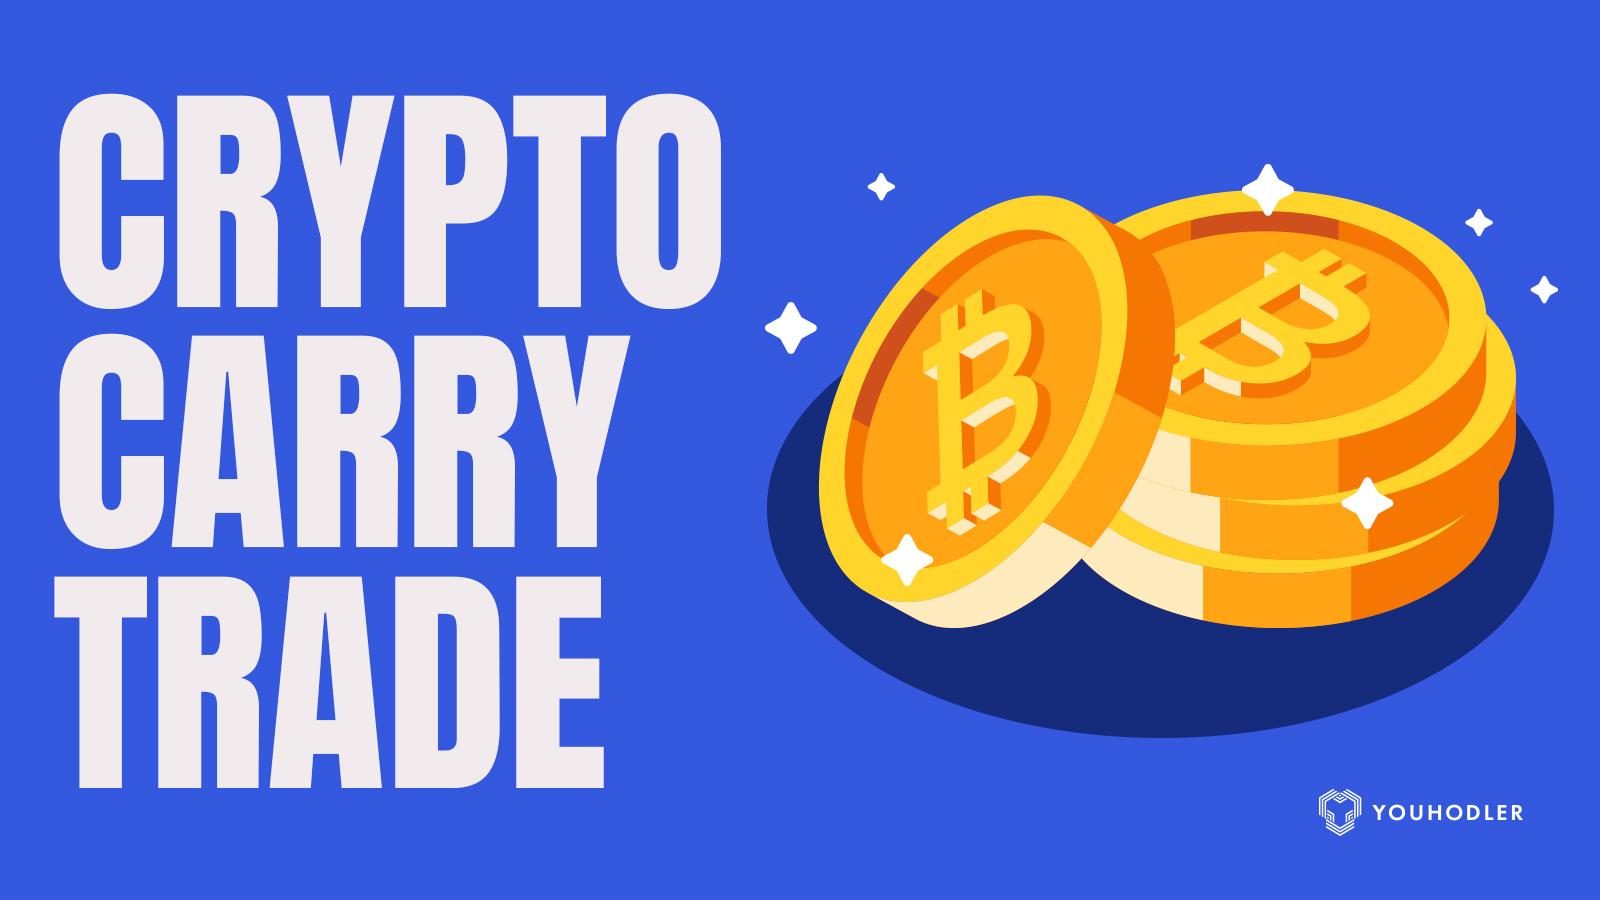 crypto traders, crypto trading, crypto trading platform, trade crypto, earn crypto, crypto earn